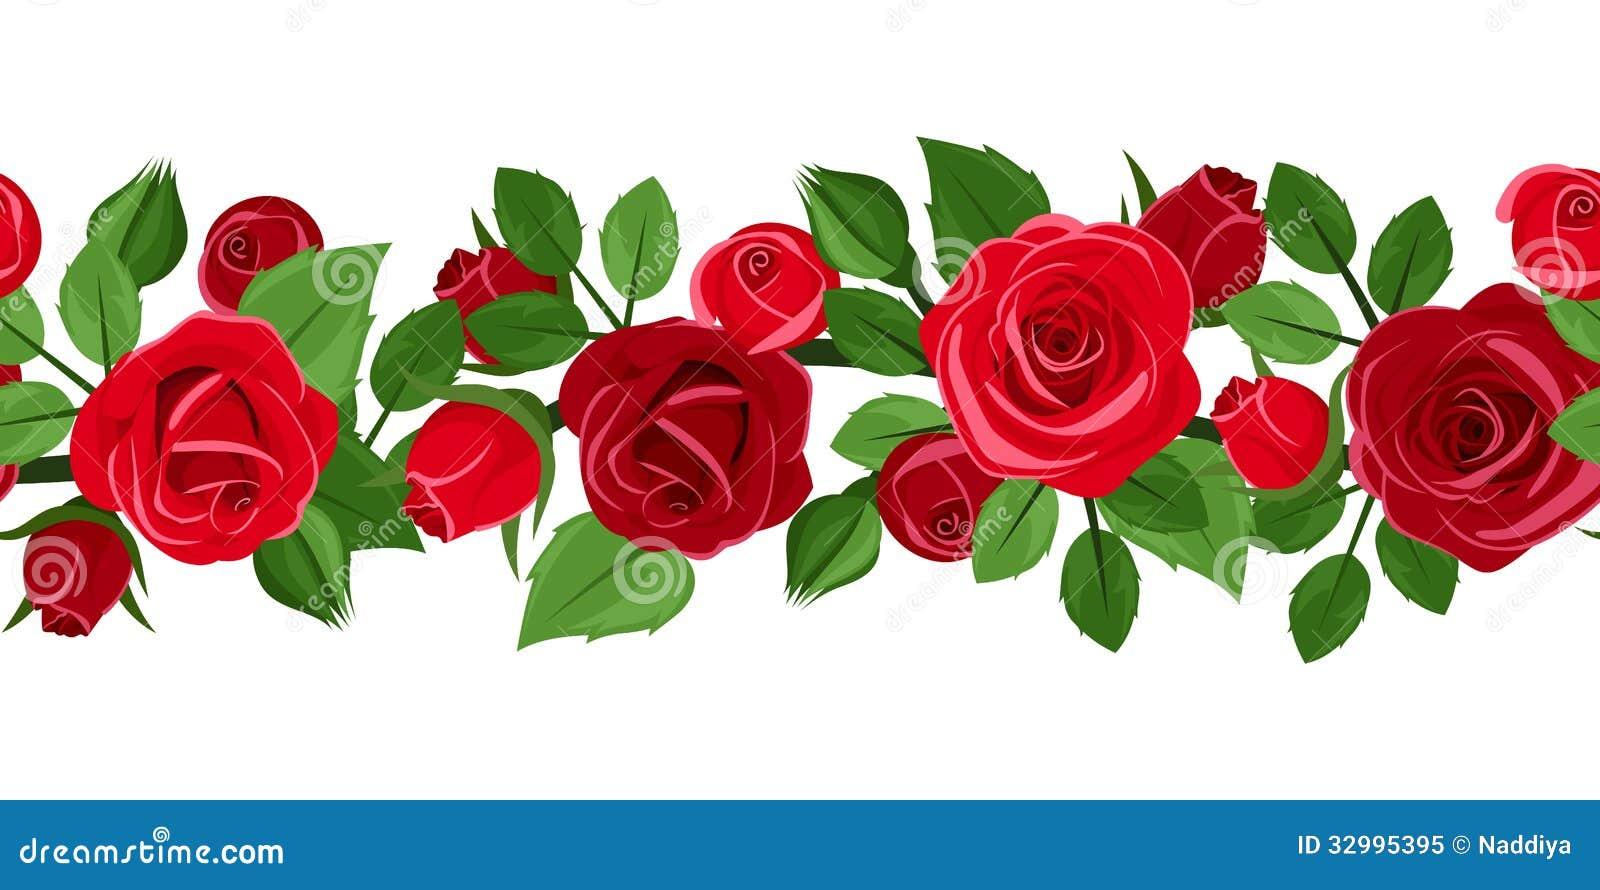 Top Keywords Picture For Red Rose Vine Clip Art - 1300x740 - jpeg